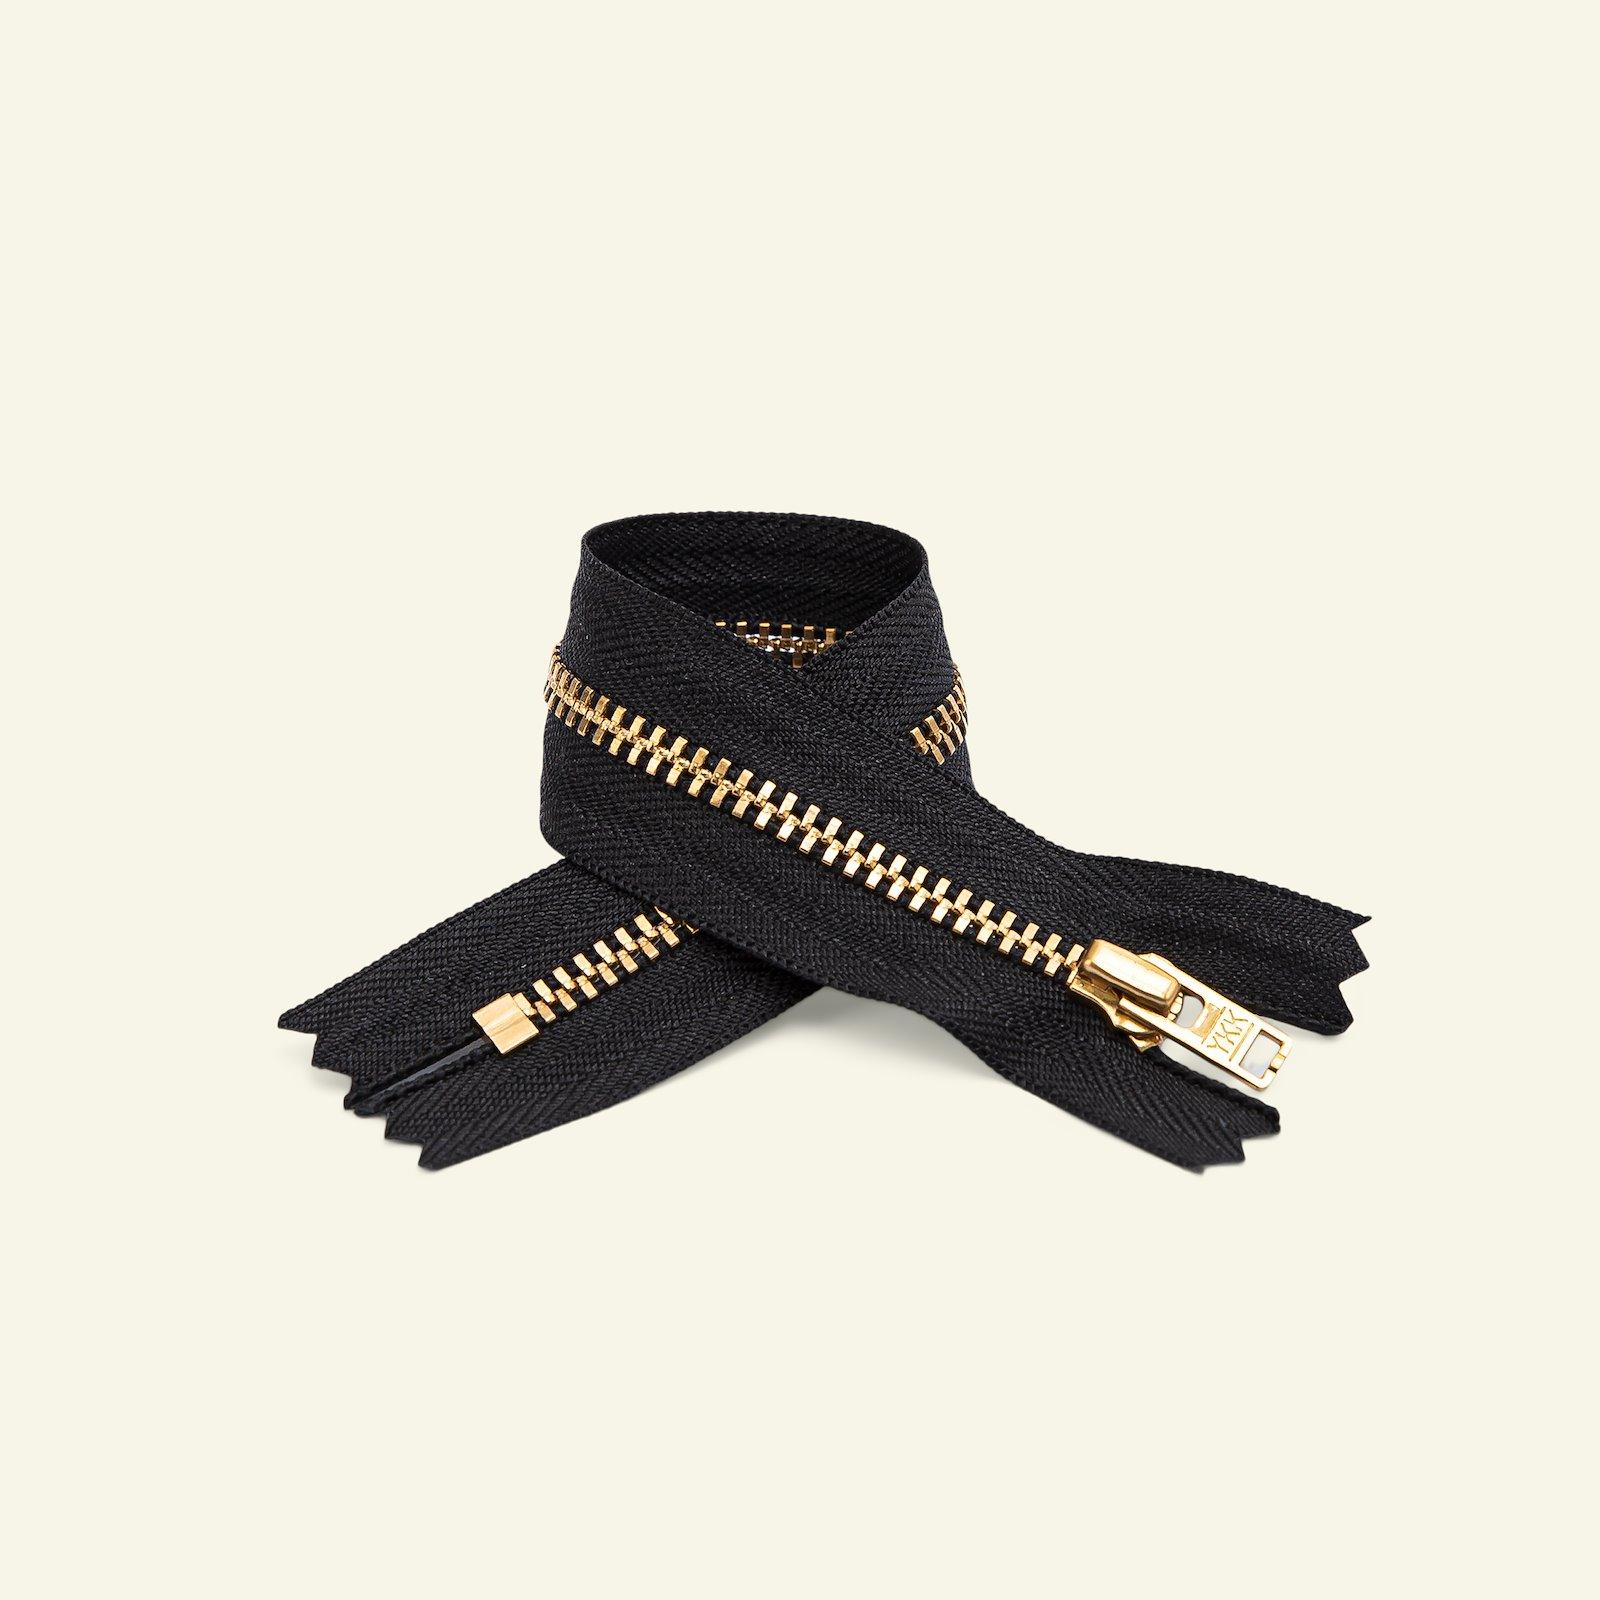 YKK zip 4mm trousers closed 15cm black x40043_pack